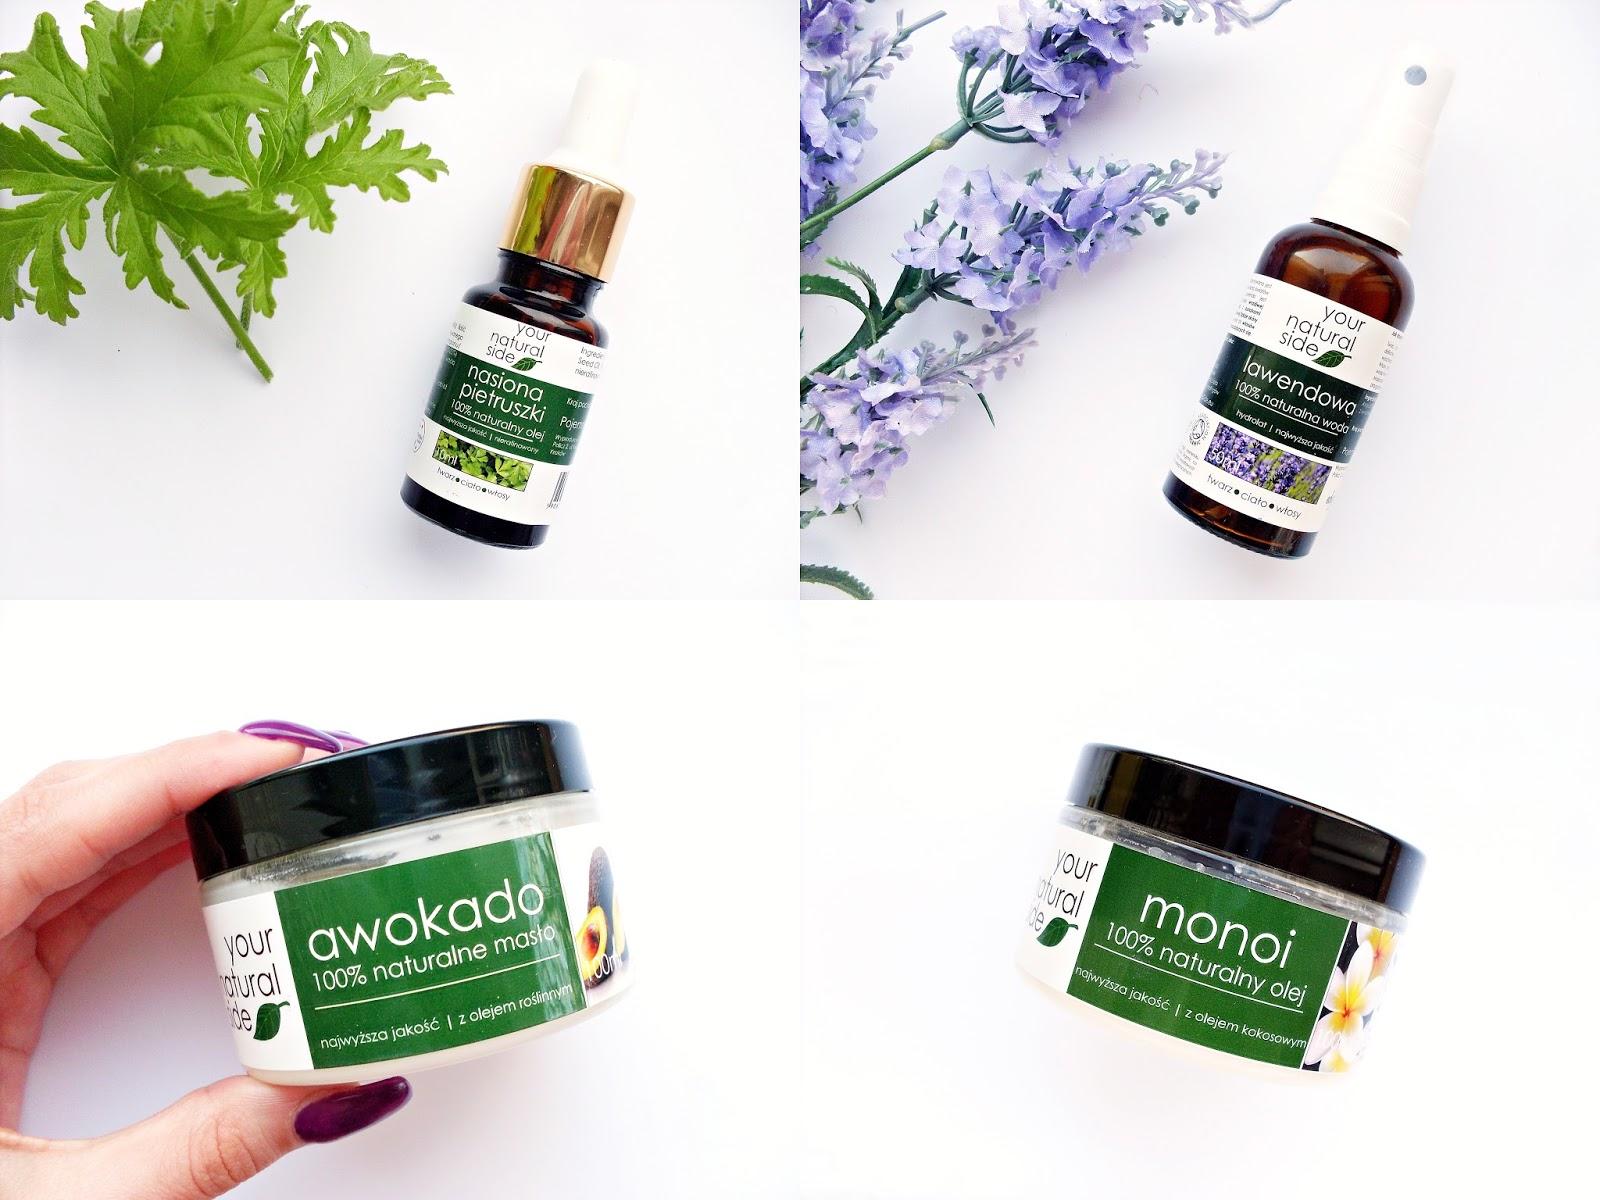 Your Natural Side - naturalne dobro dla skóry i włosów 🌱